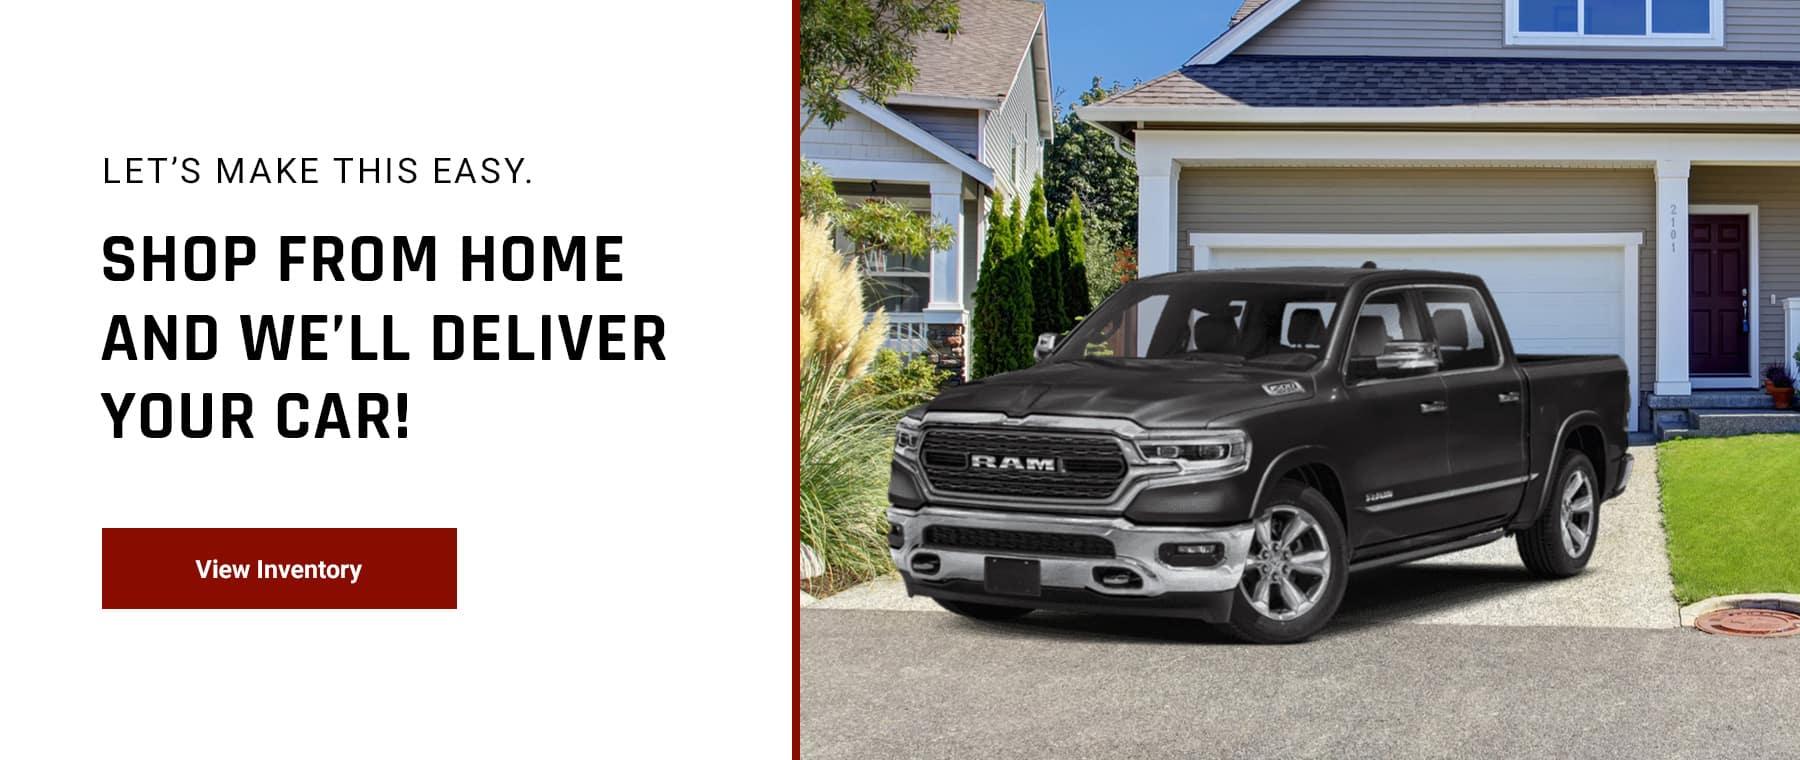 RAM_Delivery_Slider_1800x760